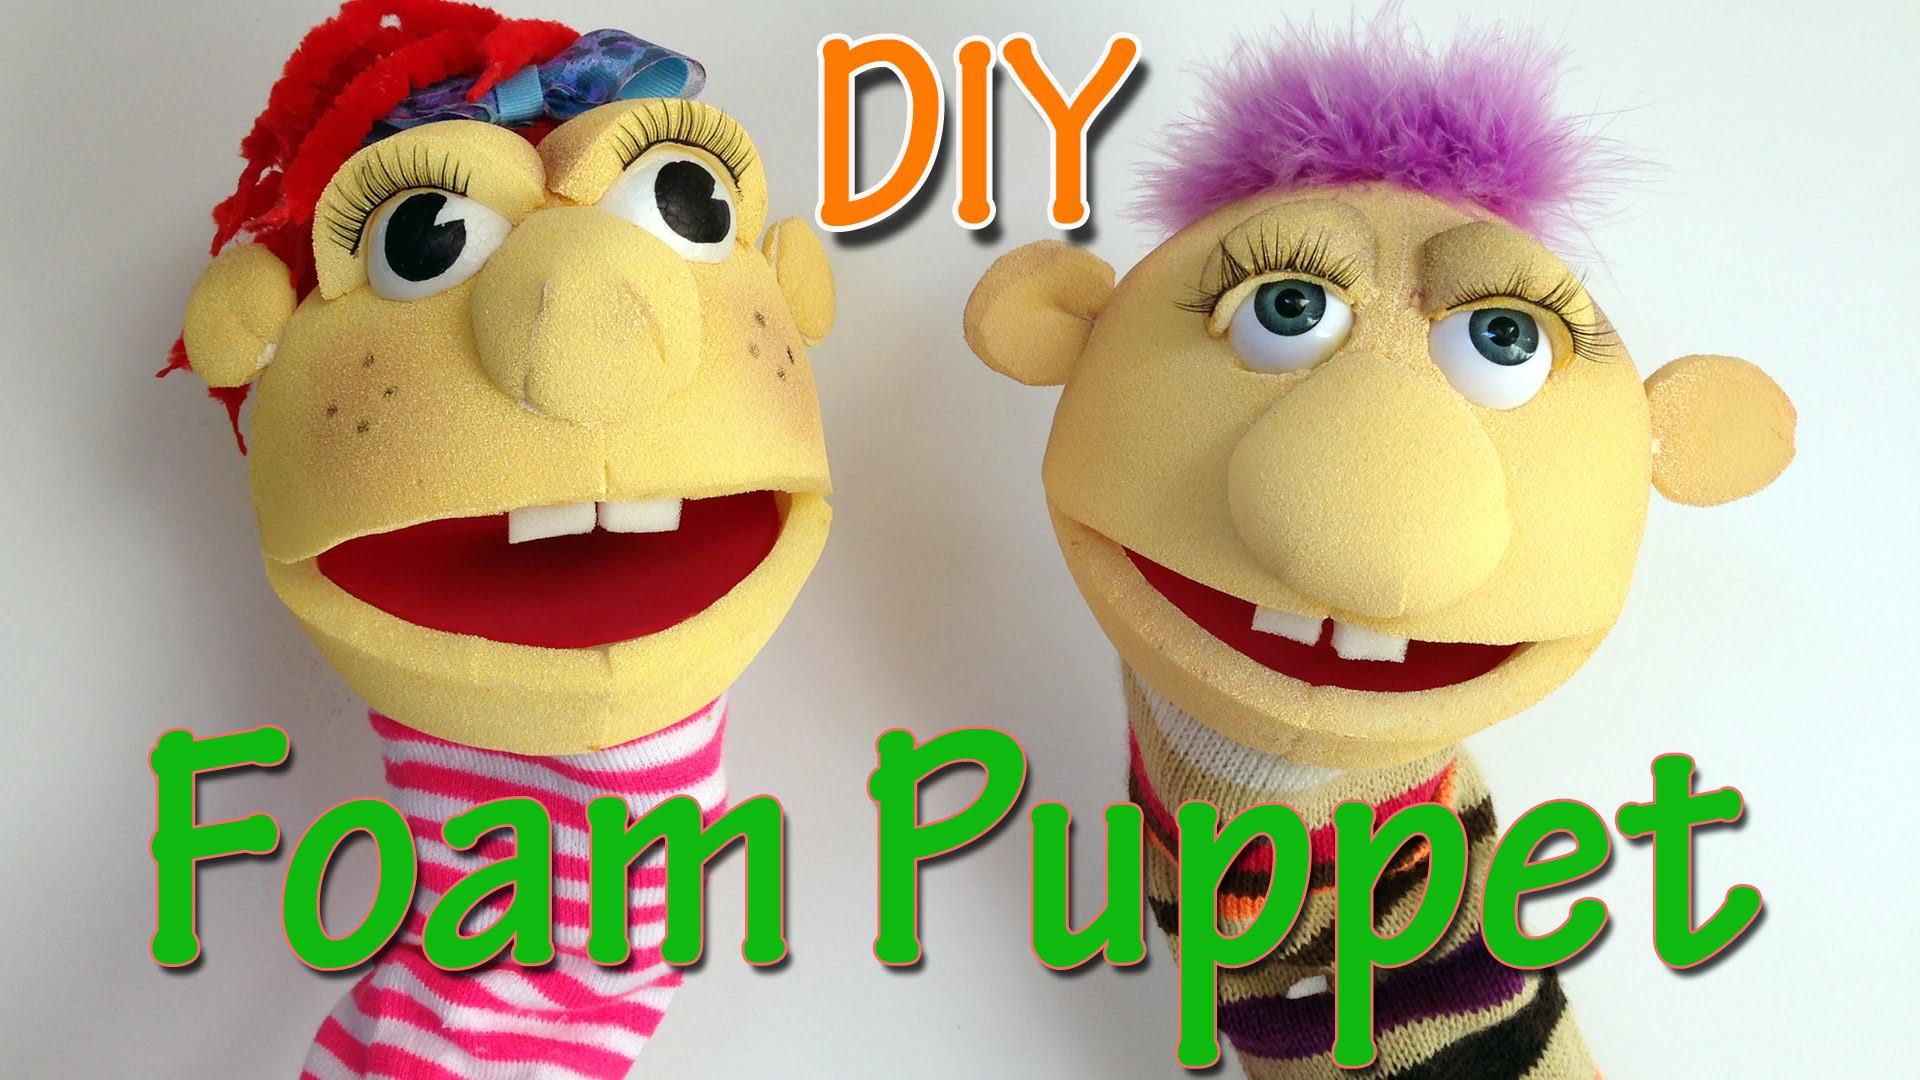 Ana DIY Crafts - How to make a Foam Puppet